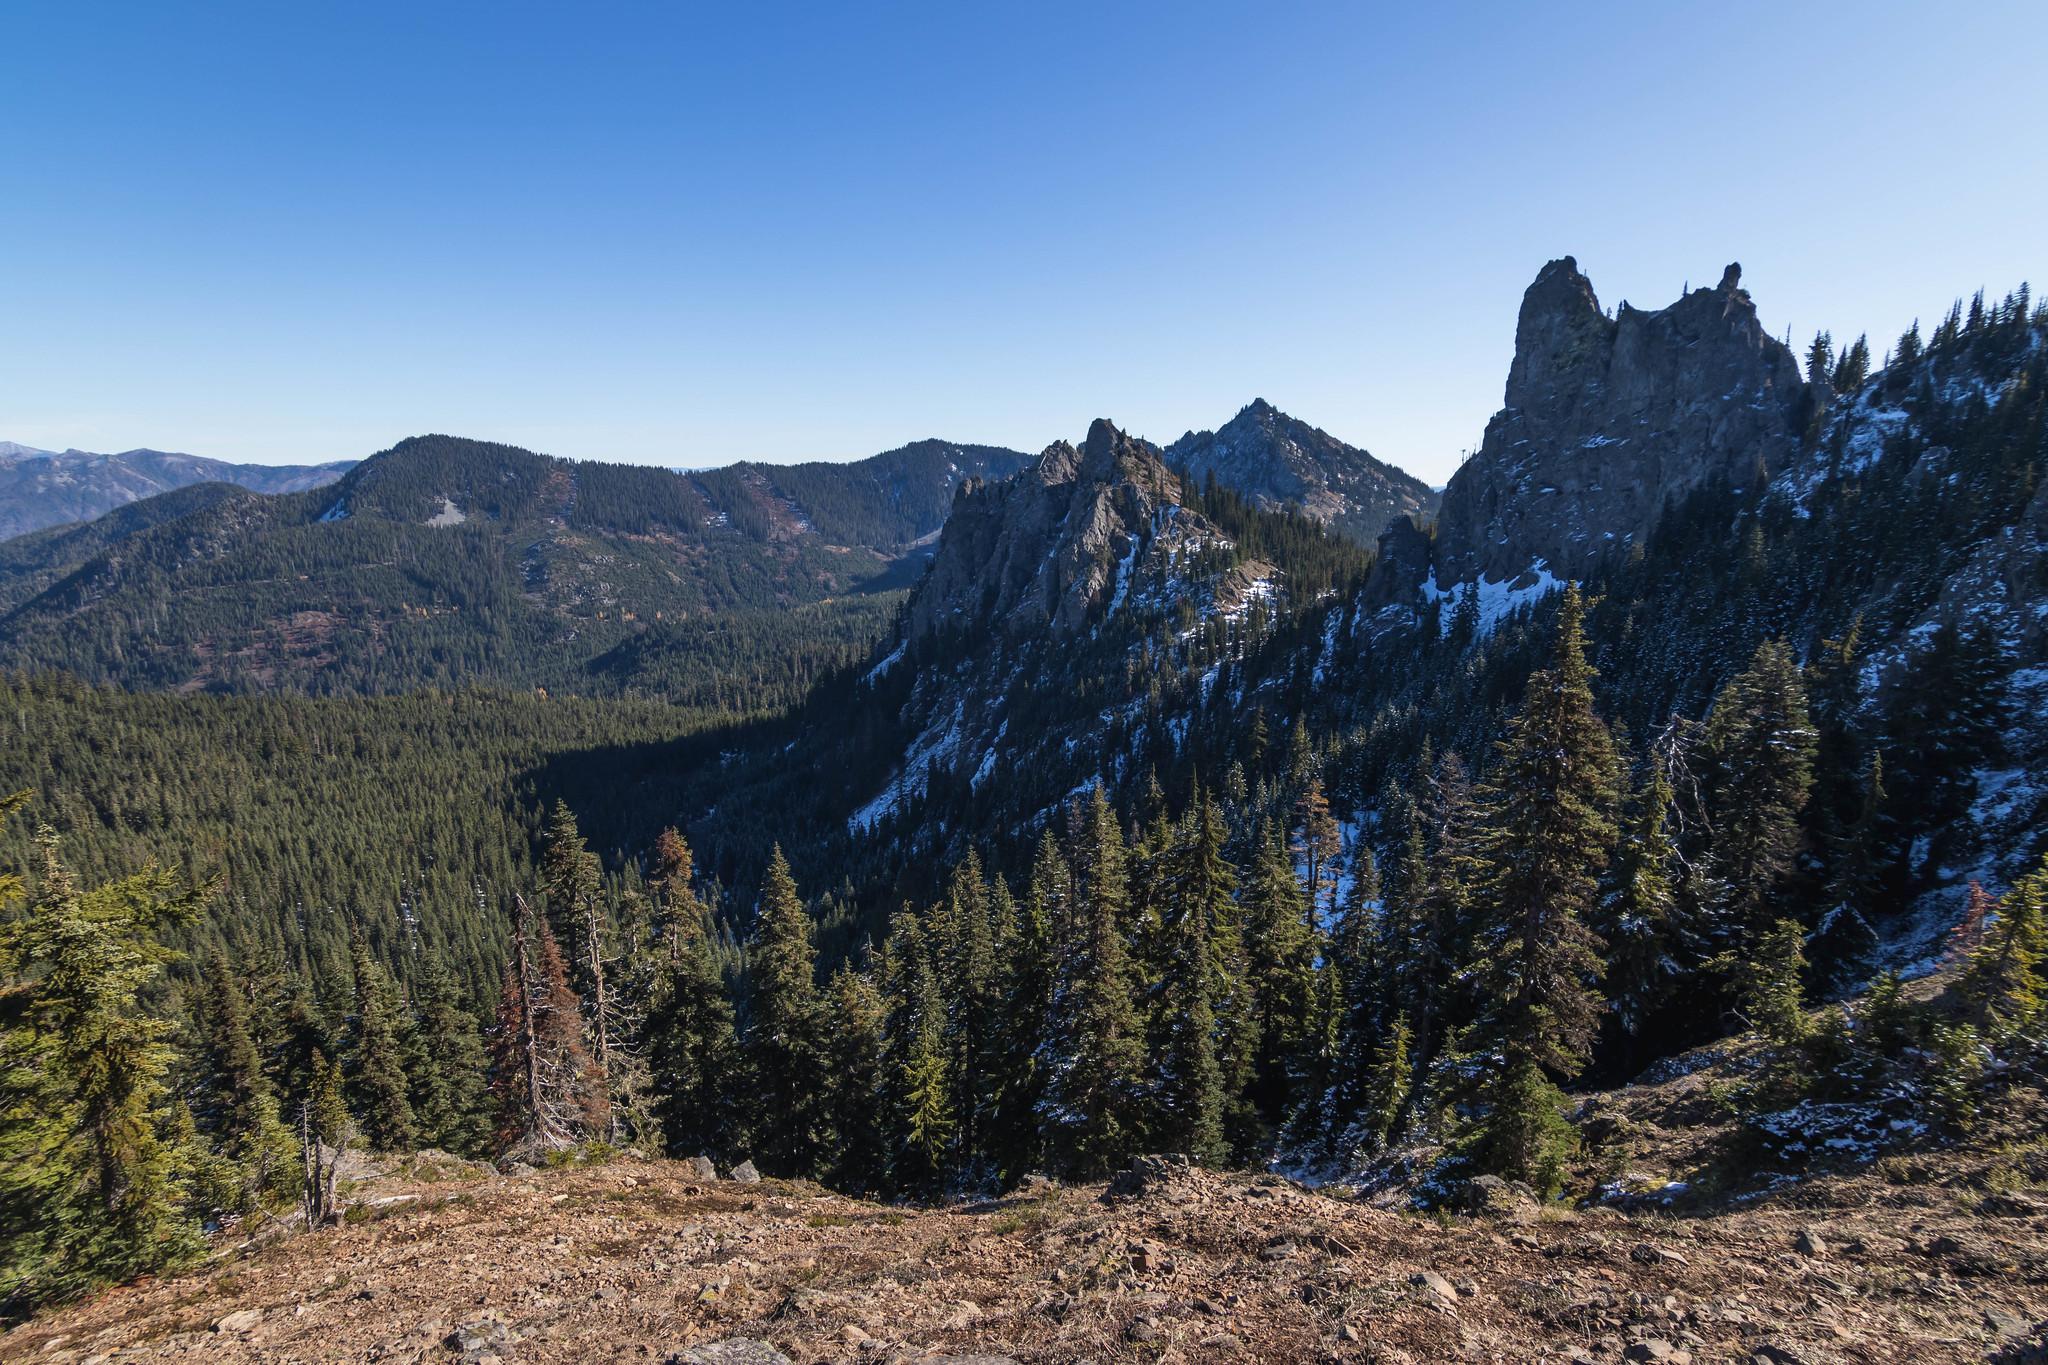 En Route to Kachess Ridge high point